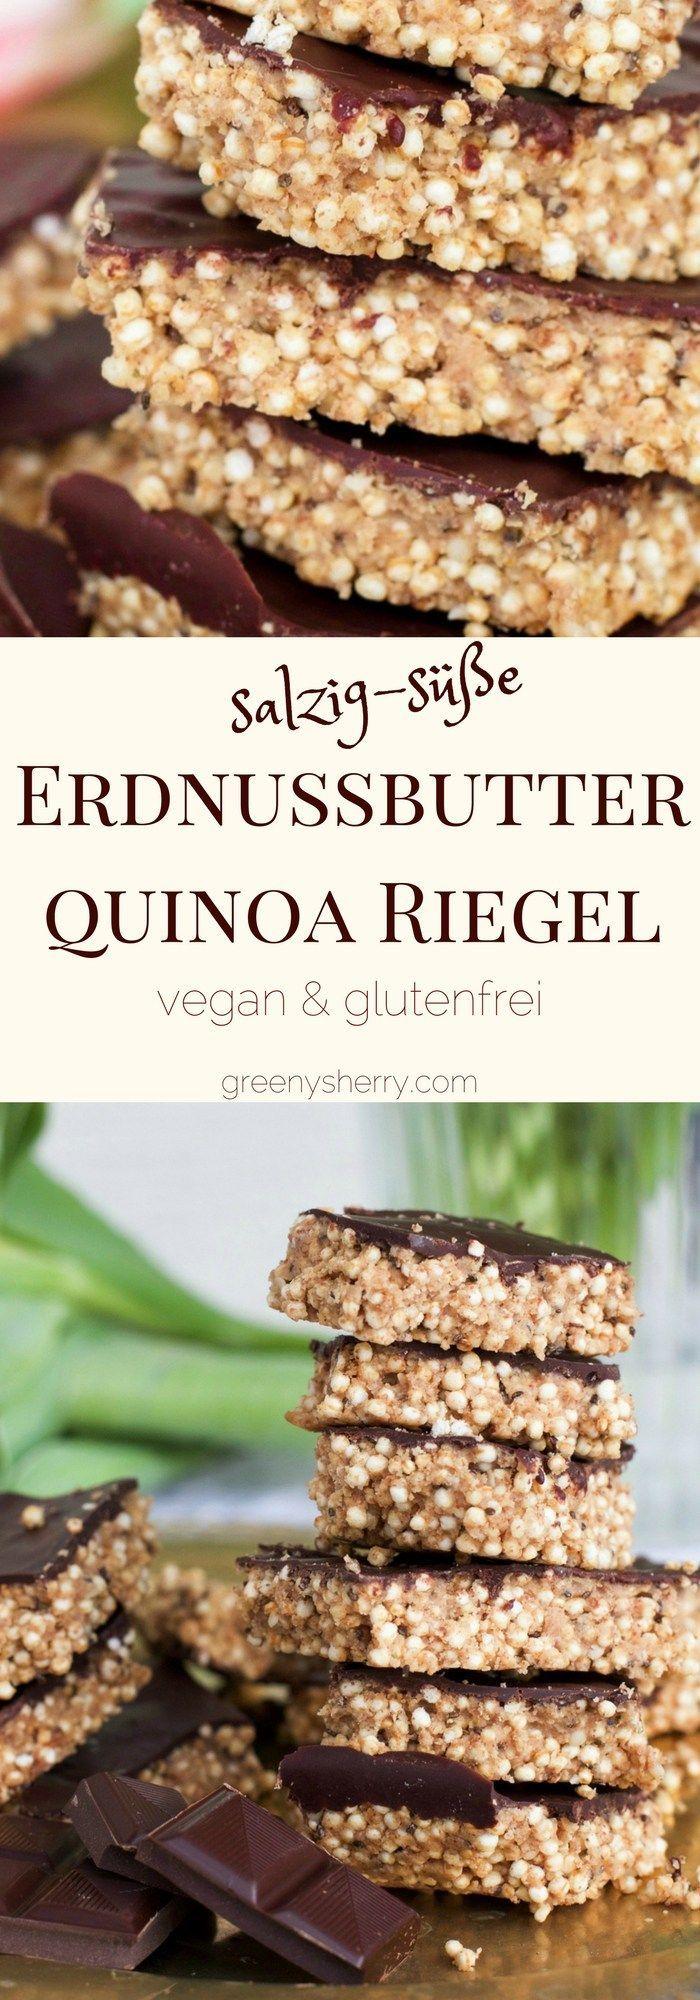 Salzig-süße Erdnussbutter Quinoa Riegel mit Schokolade (vegan &glutenfrei)